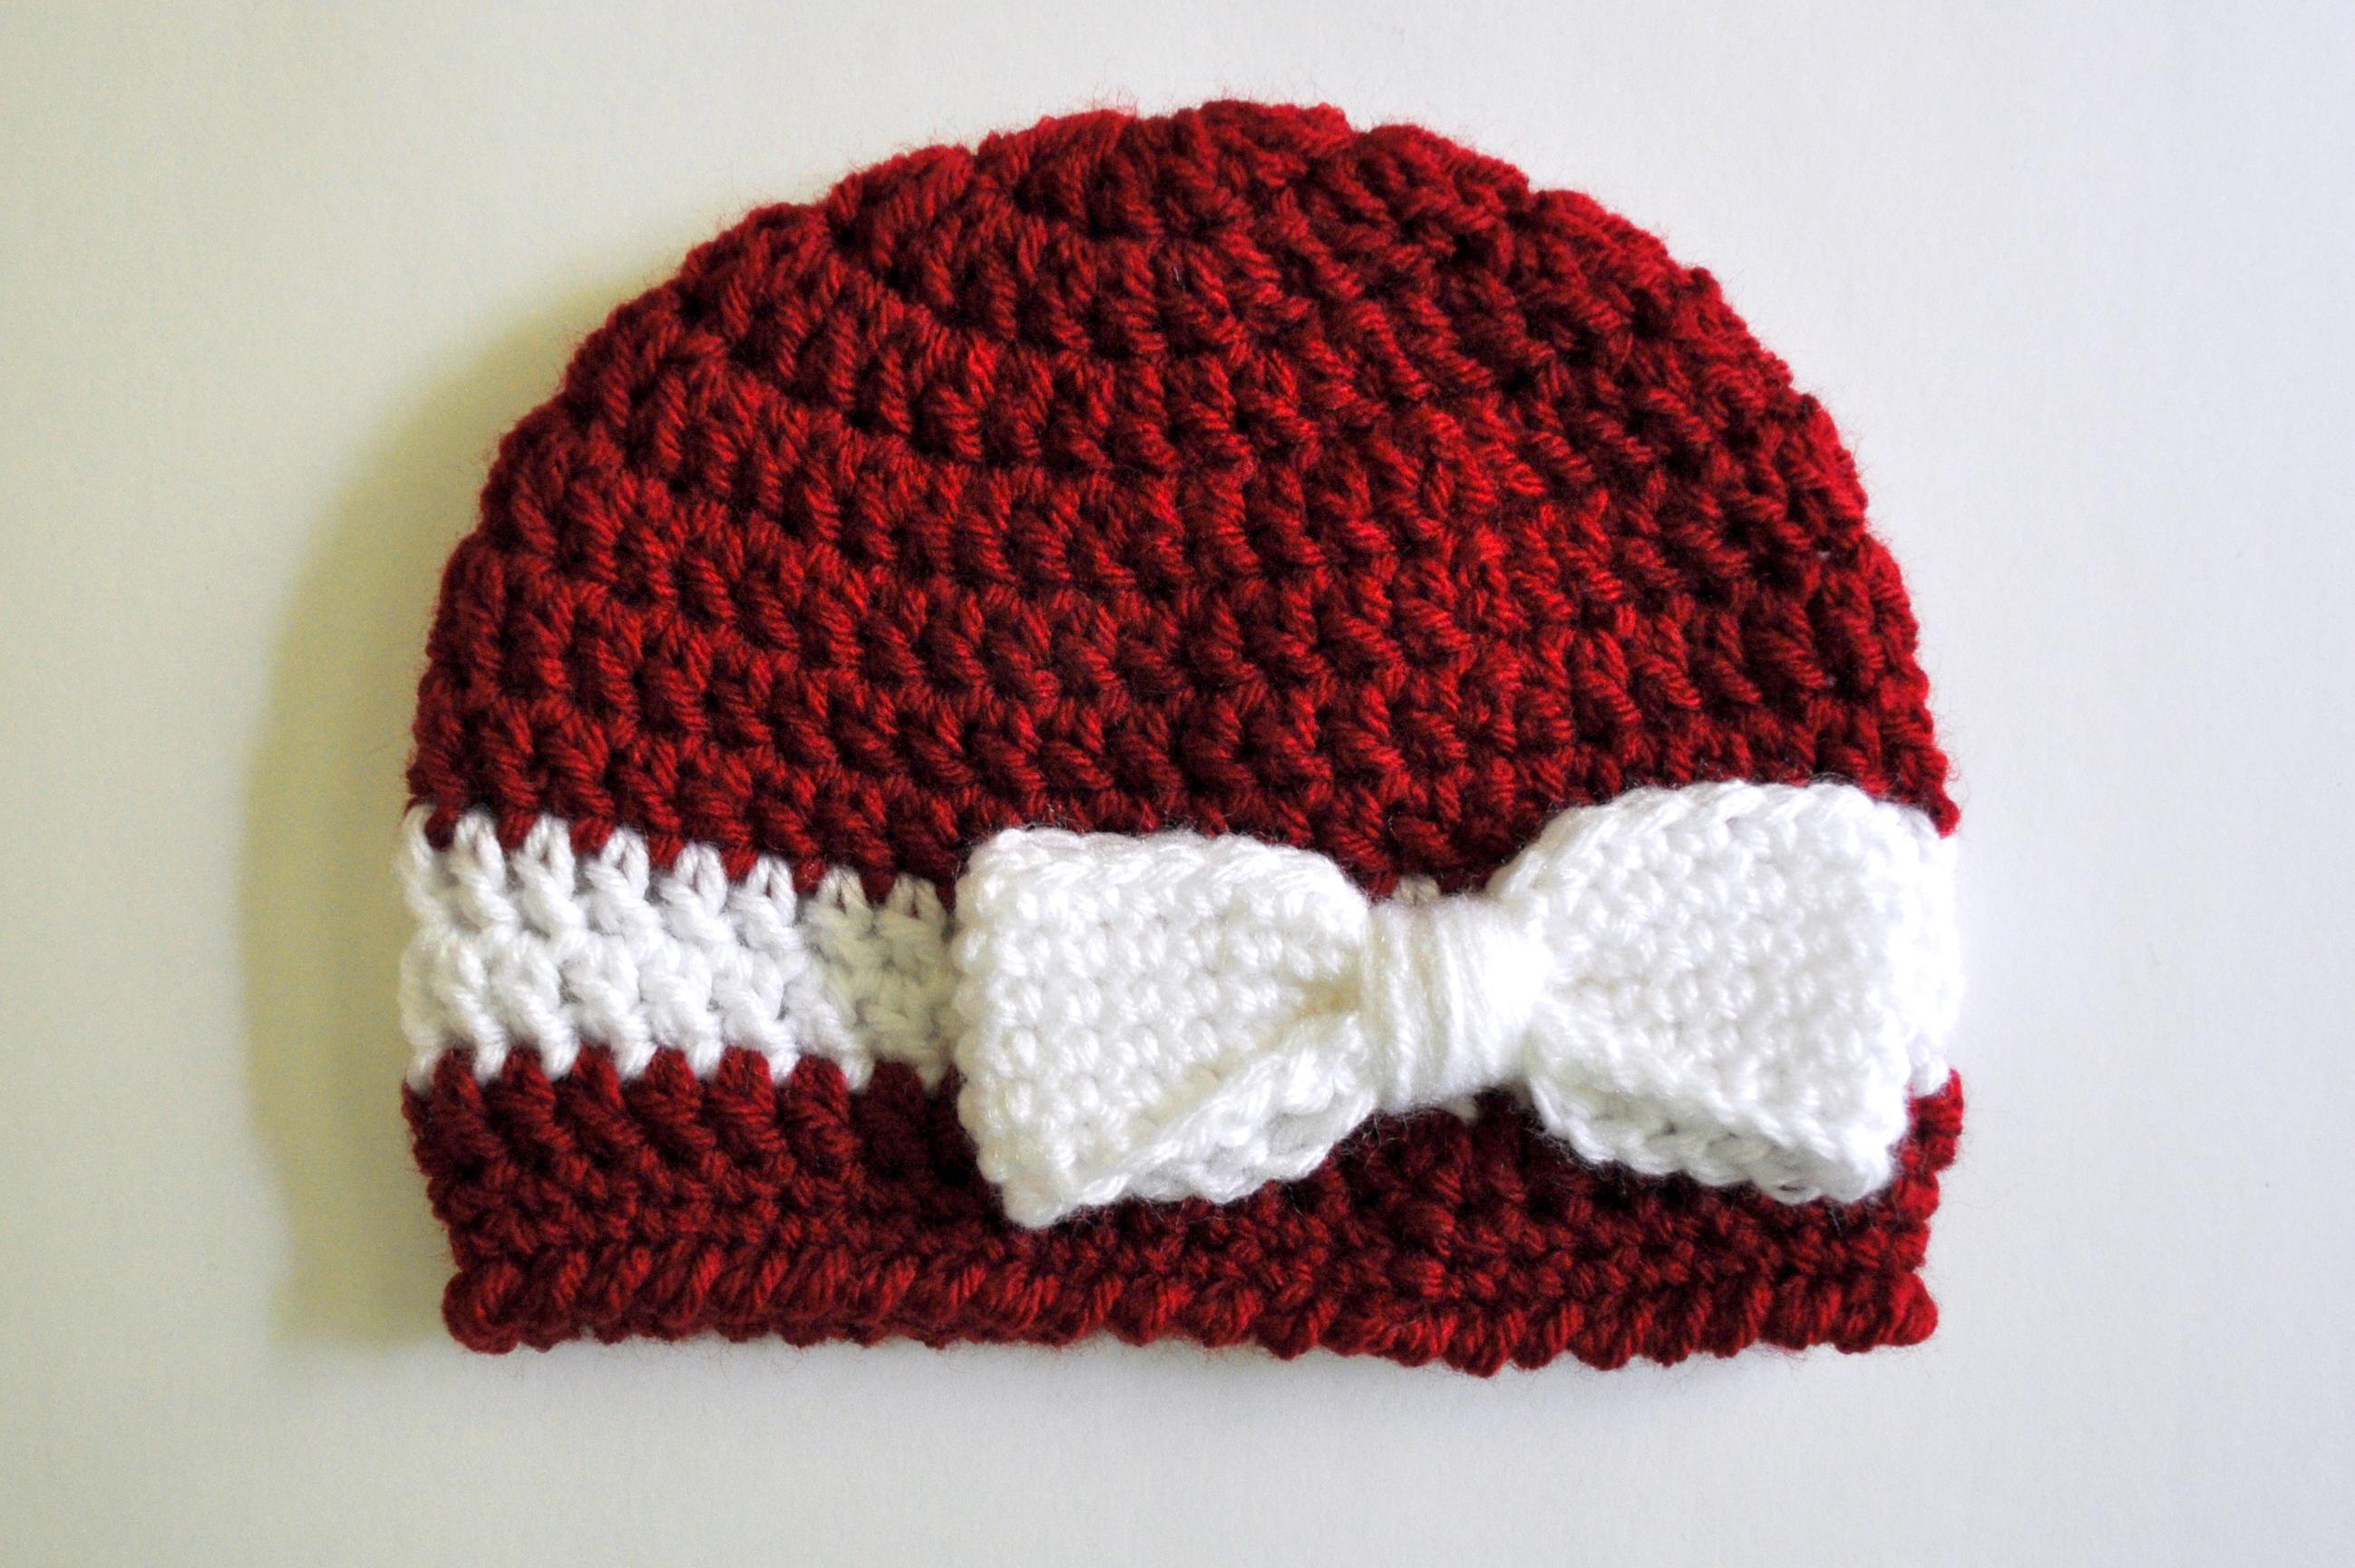 Crochet Infant Hats Free Pattern Free Pattern Crochet Bow And Ribbon Ba Hat Classy Crochet